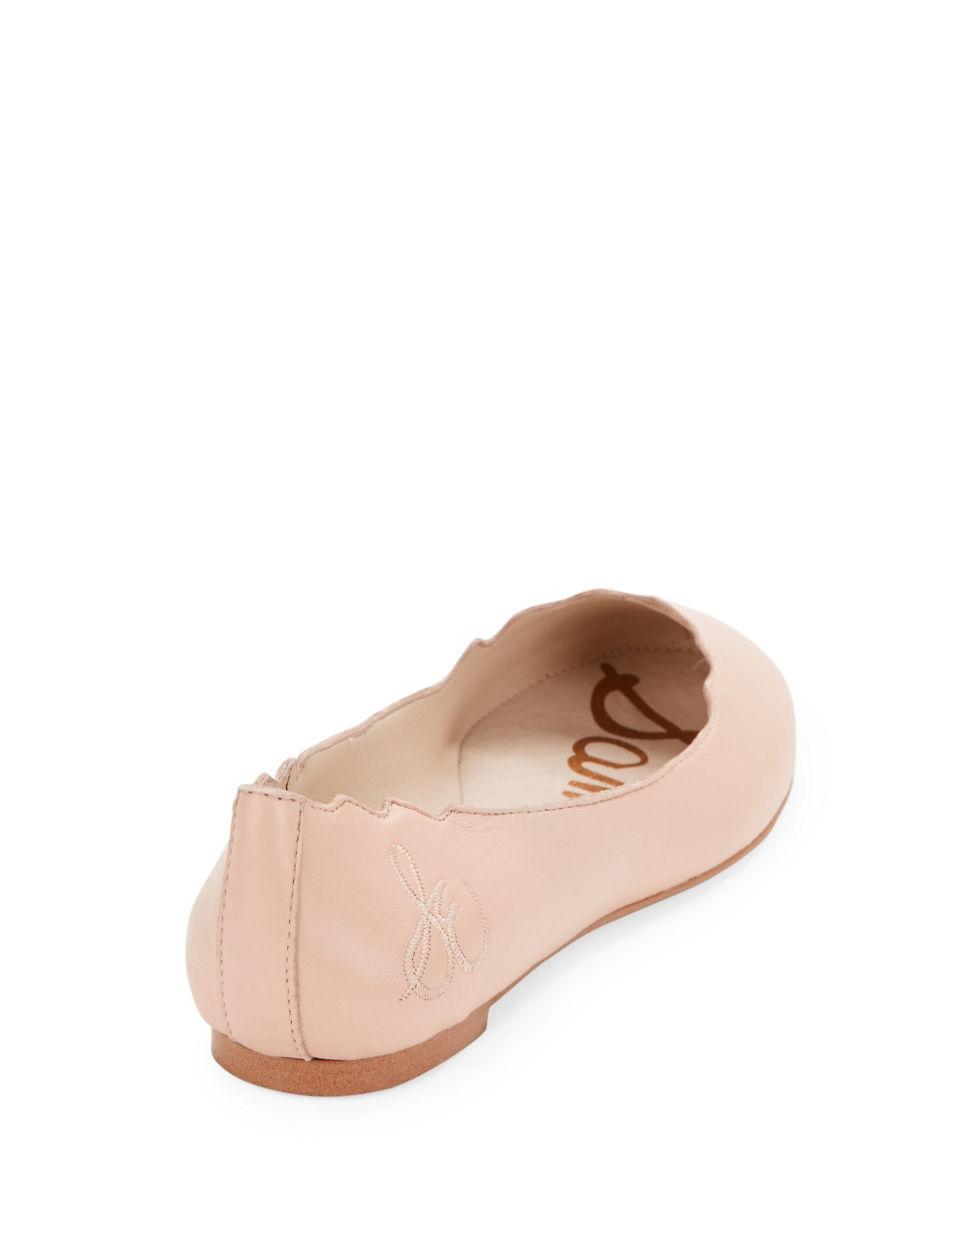 78782574707f52 Sam Edelman Augusta Leather Ballet Flats in Pink - Lyst